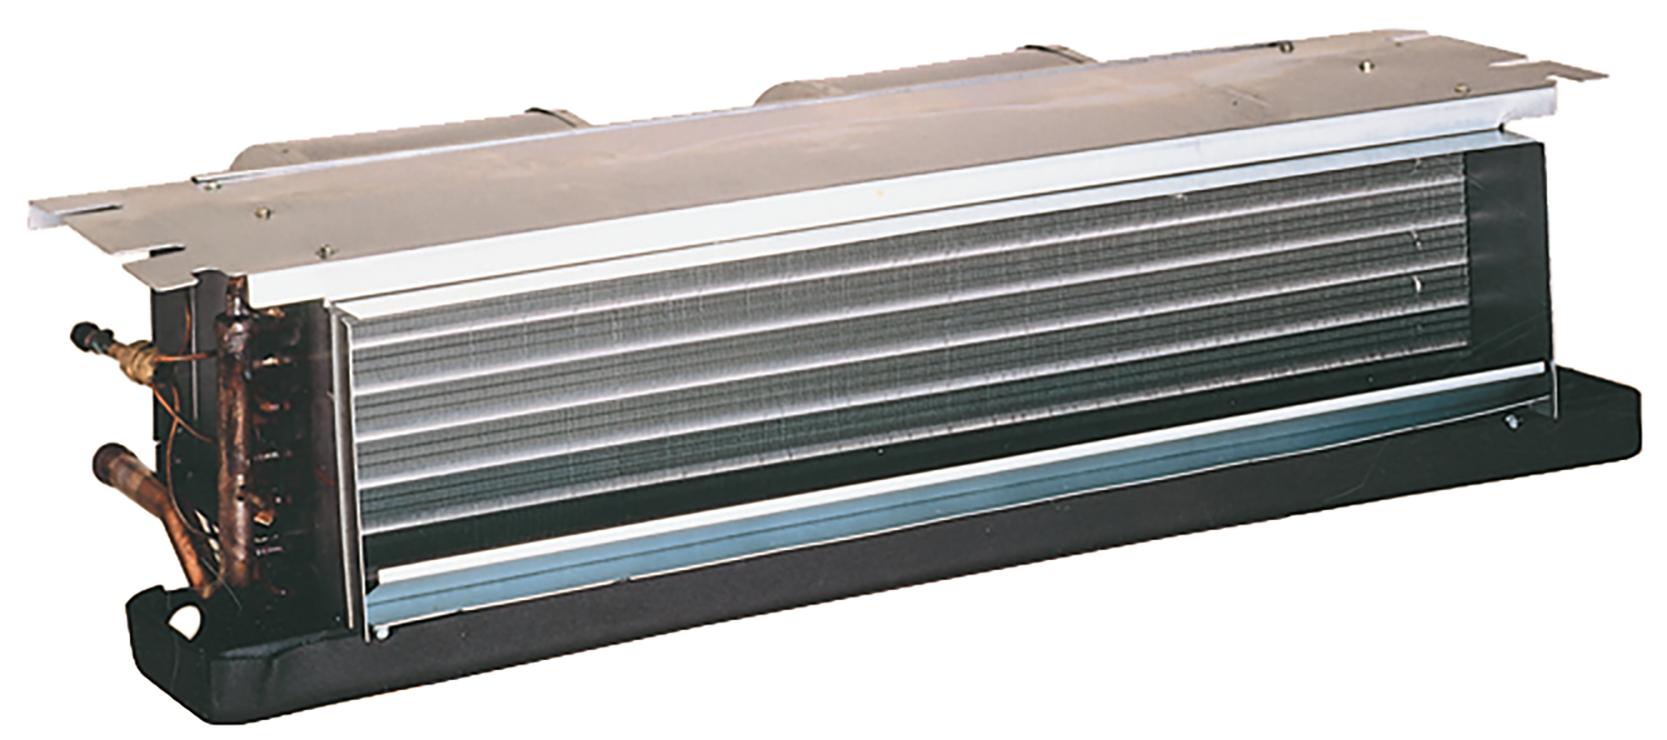 Ceiling Heat Exchanger : Goodman recalls air handlers due to electrical shock